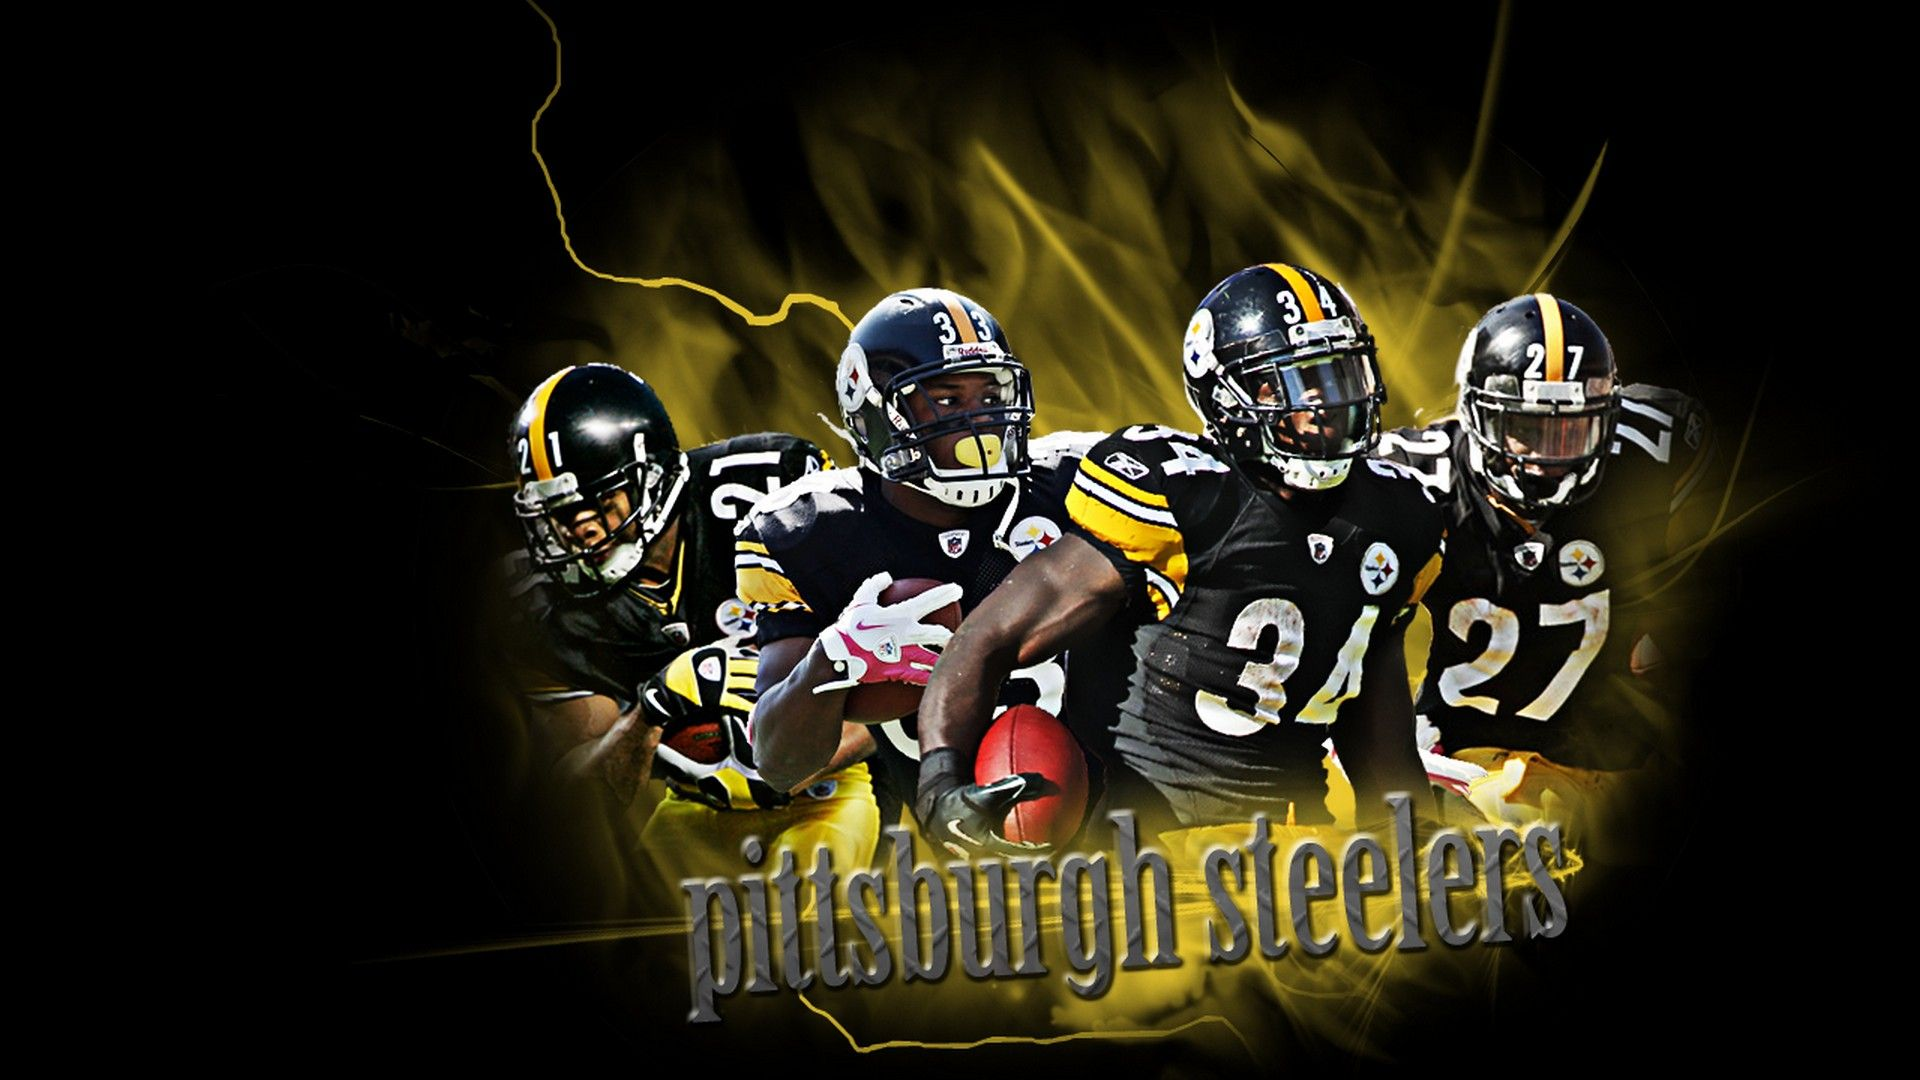 Steelers Wallpaper HD Football wallpaper, Wallpaper, Nfl